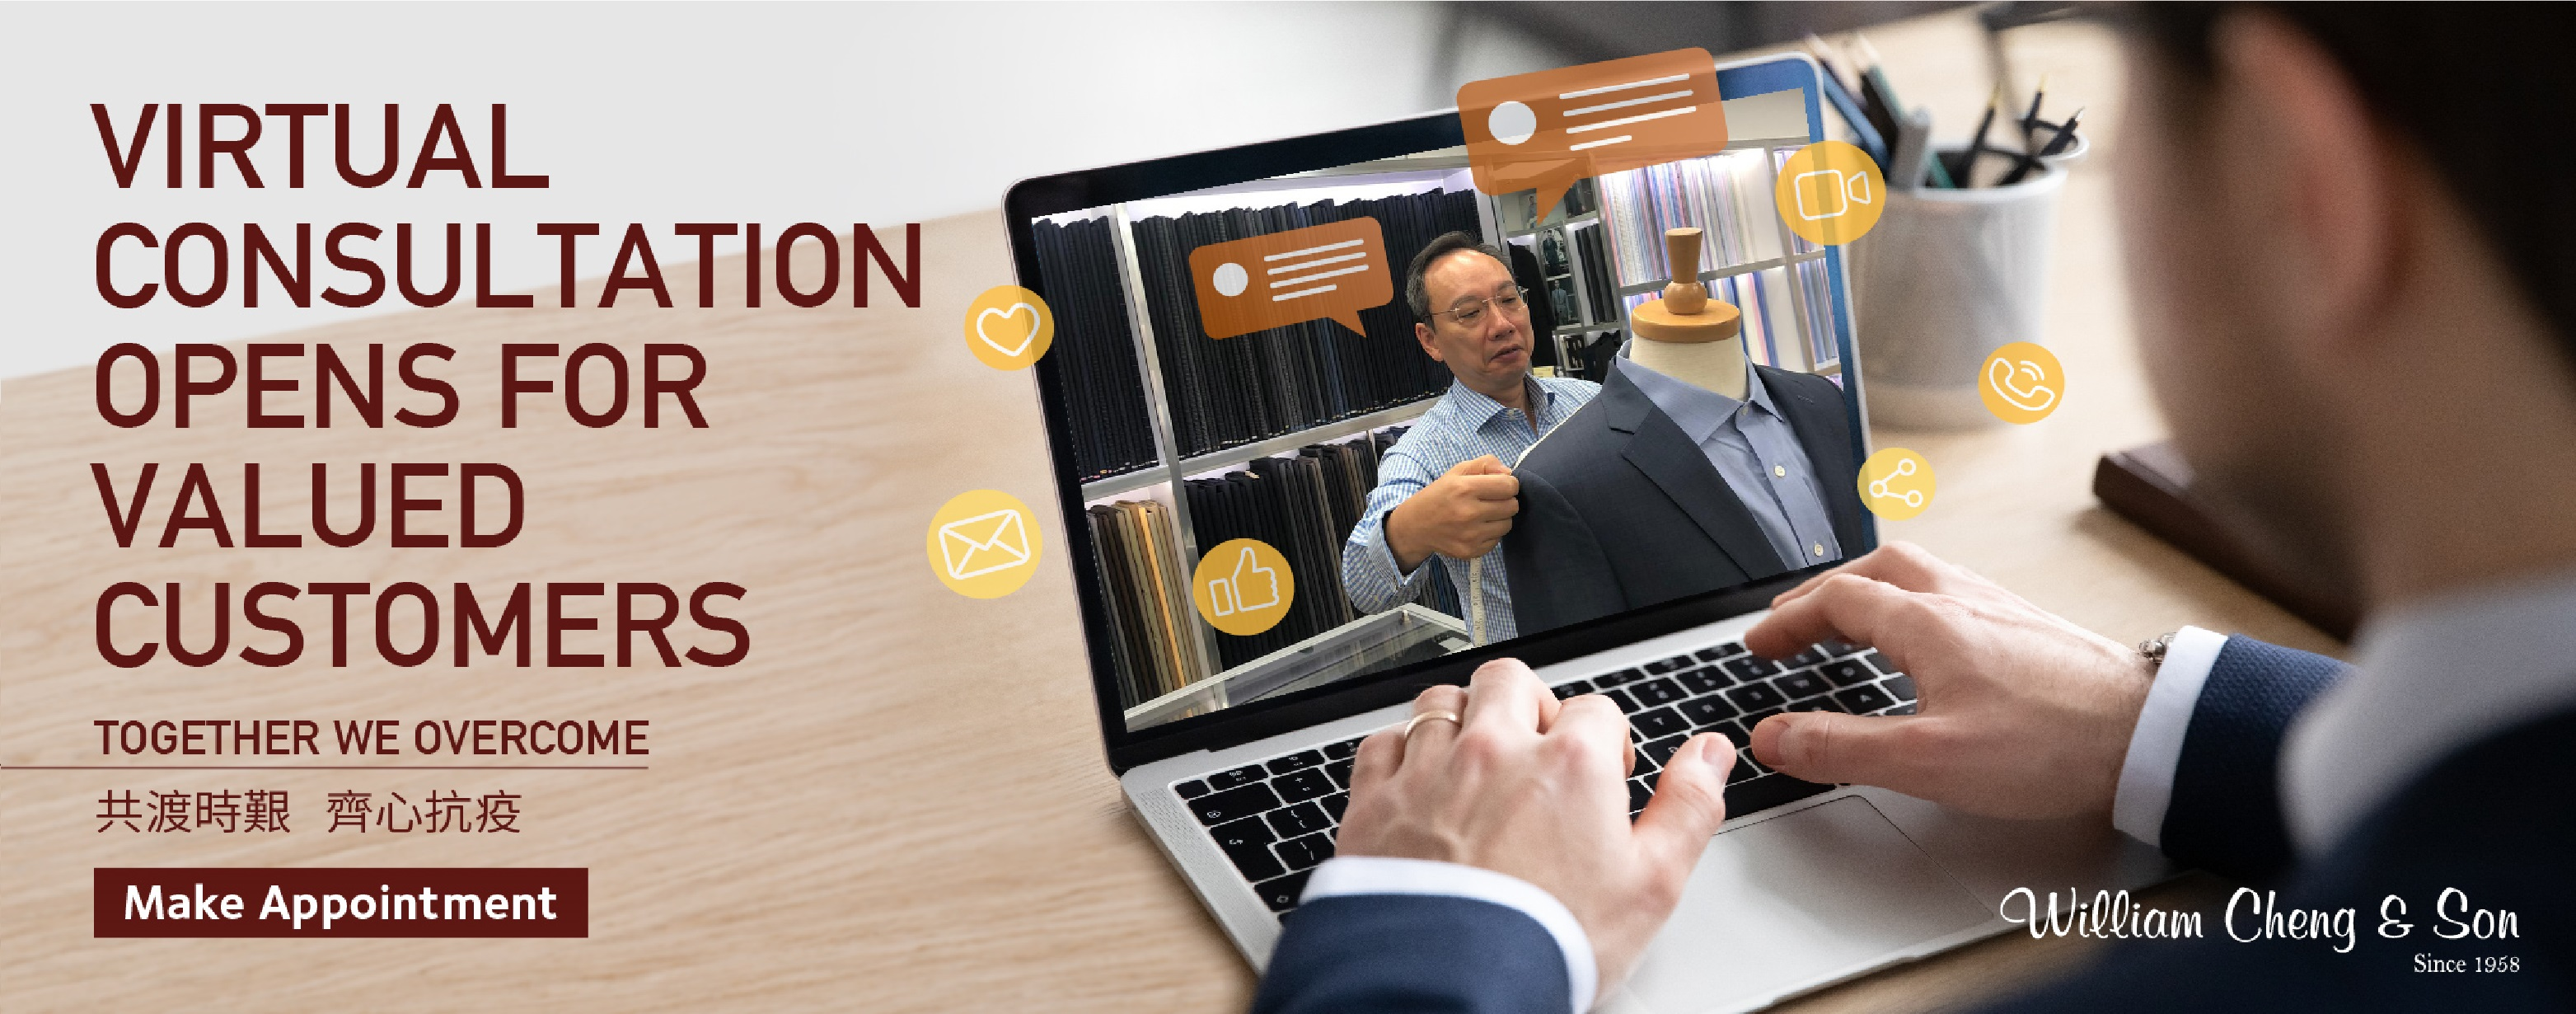 Virtual consulation